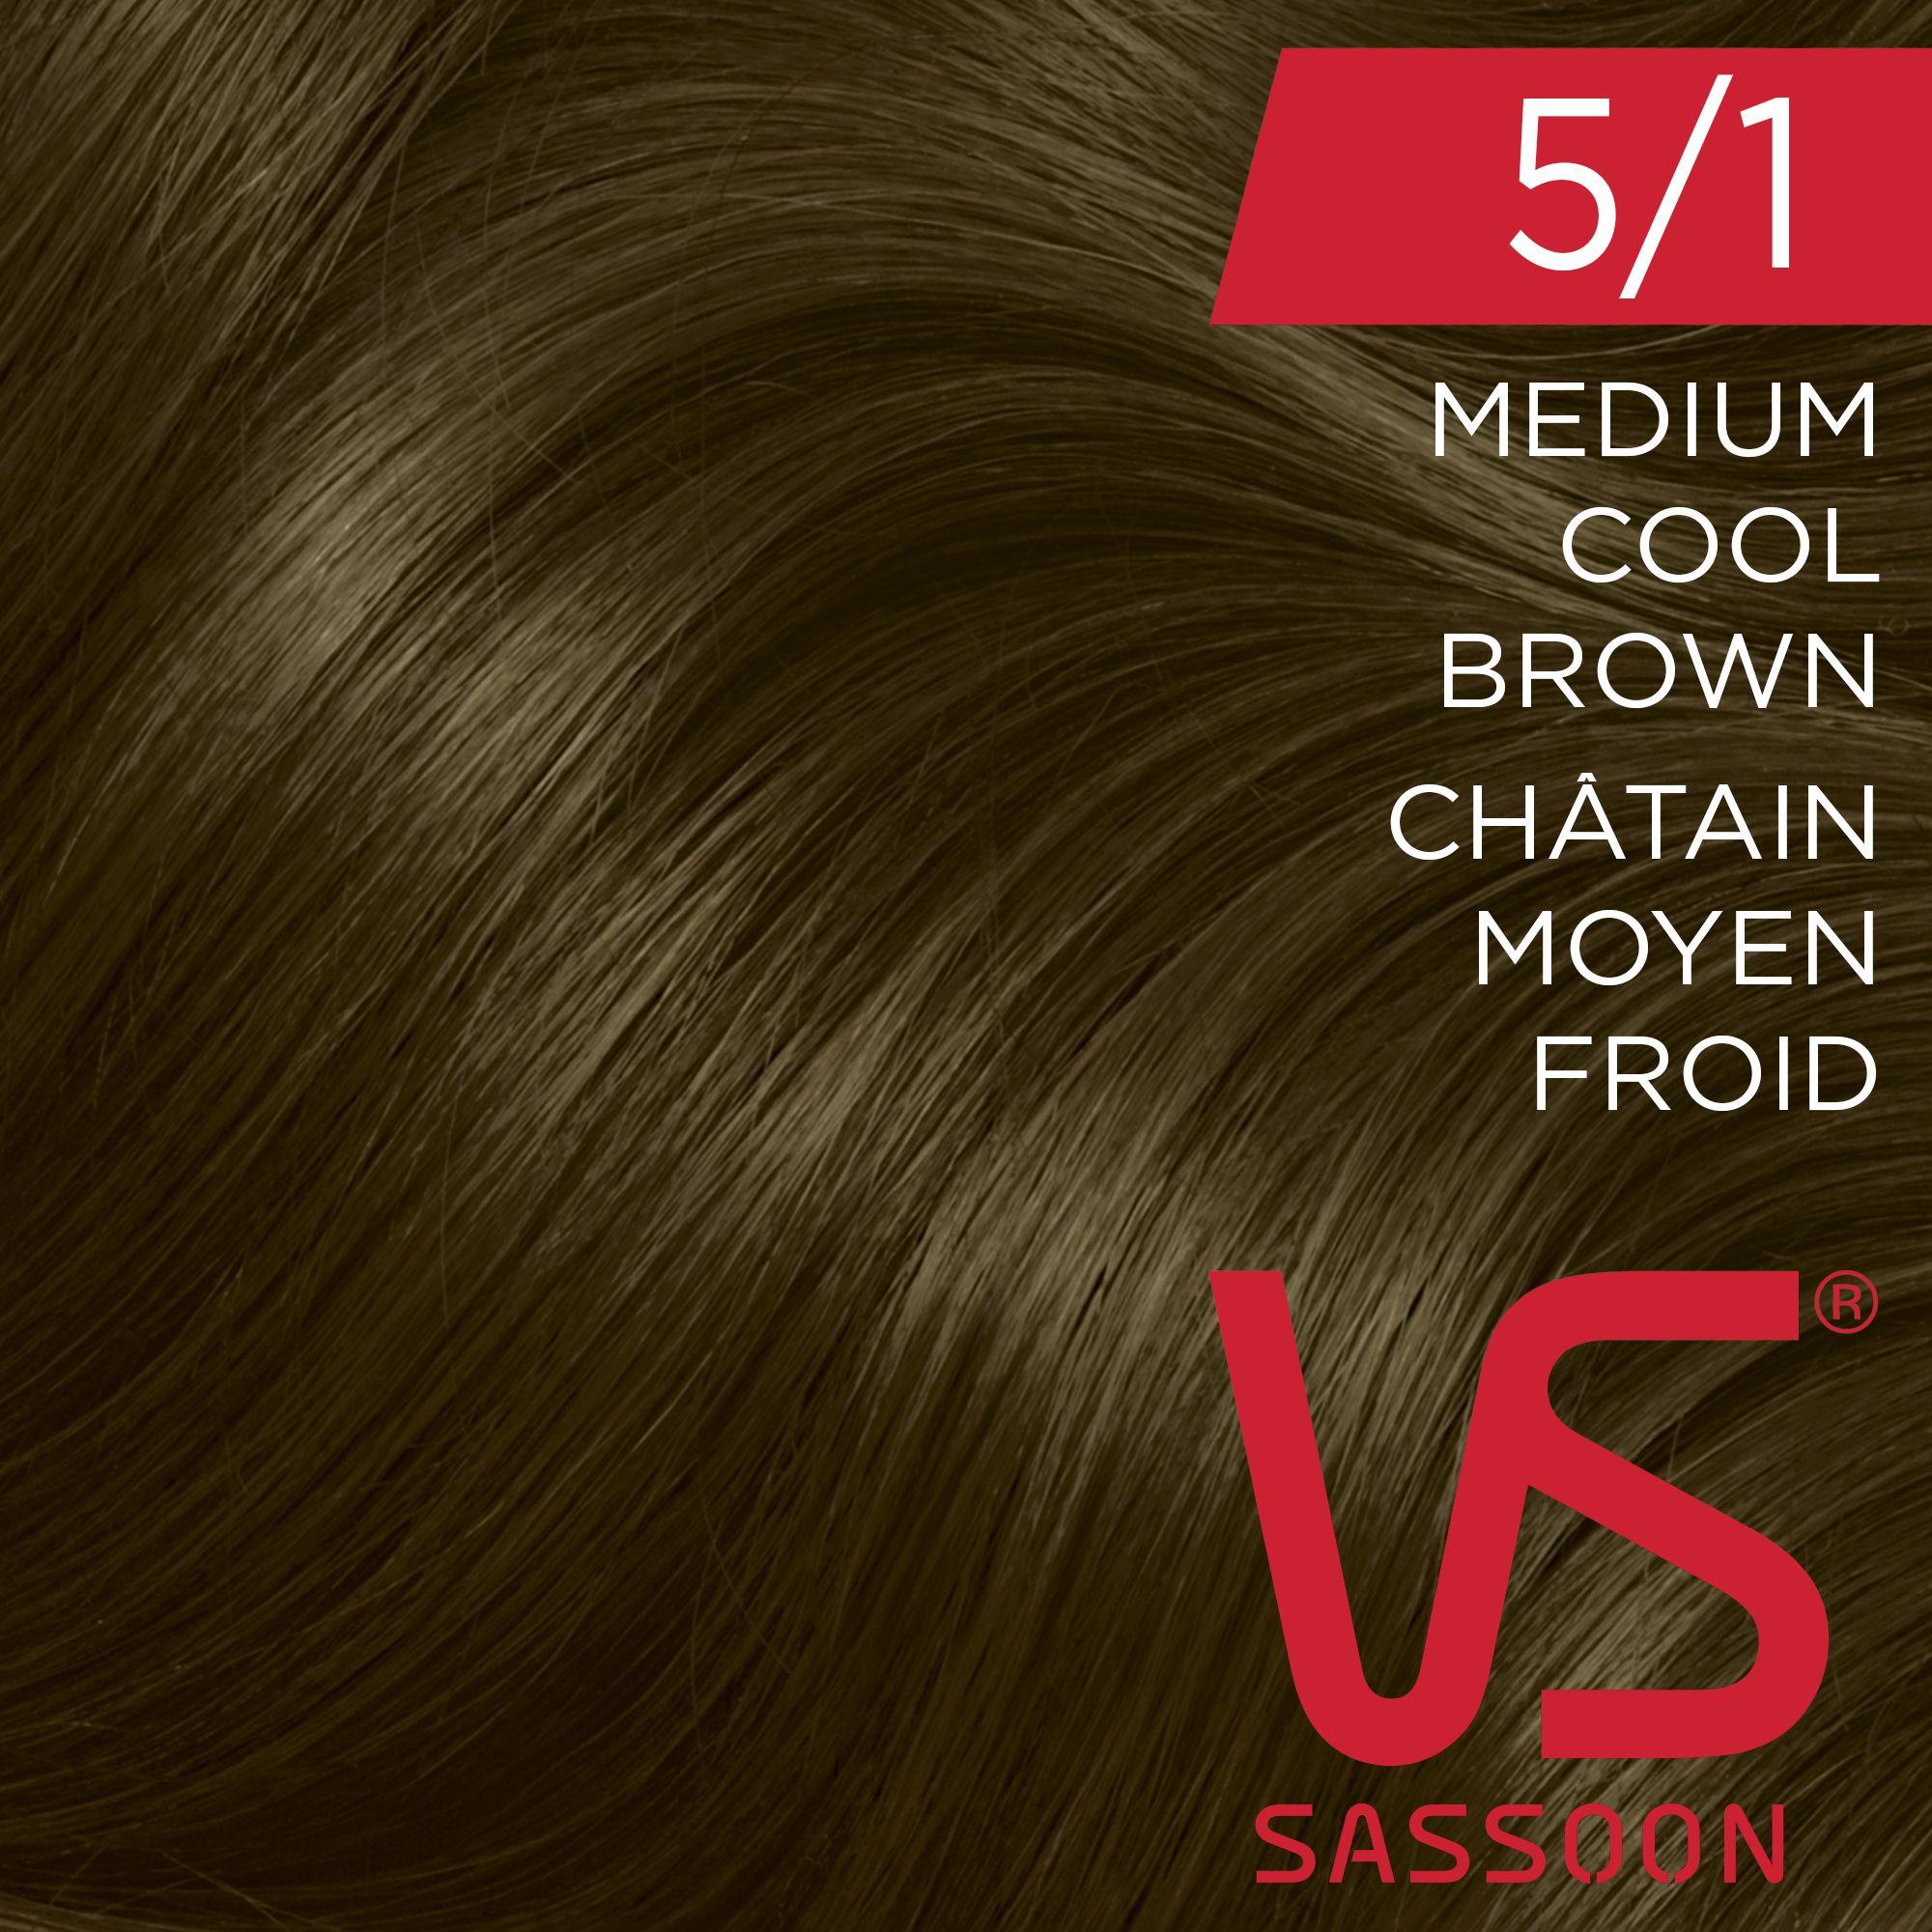 Hair Color Ideas For Brunettes Vidal Sassoon Salonist At Home Hair